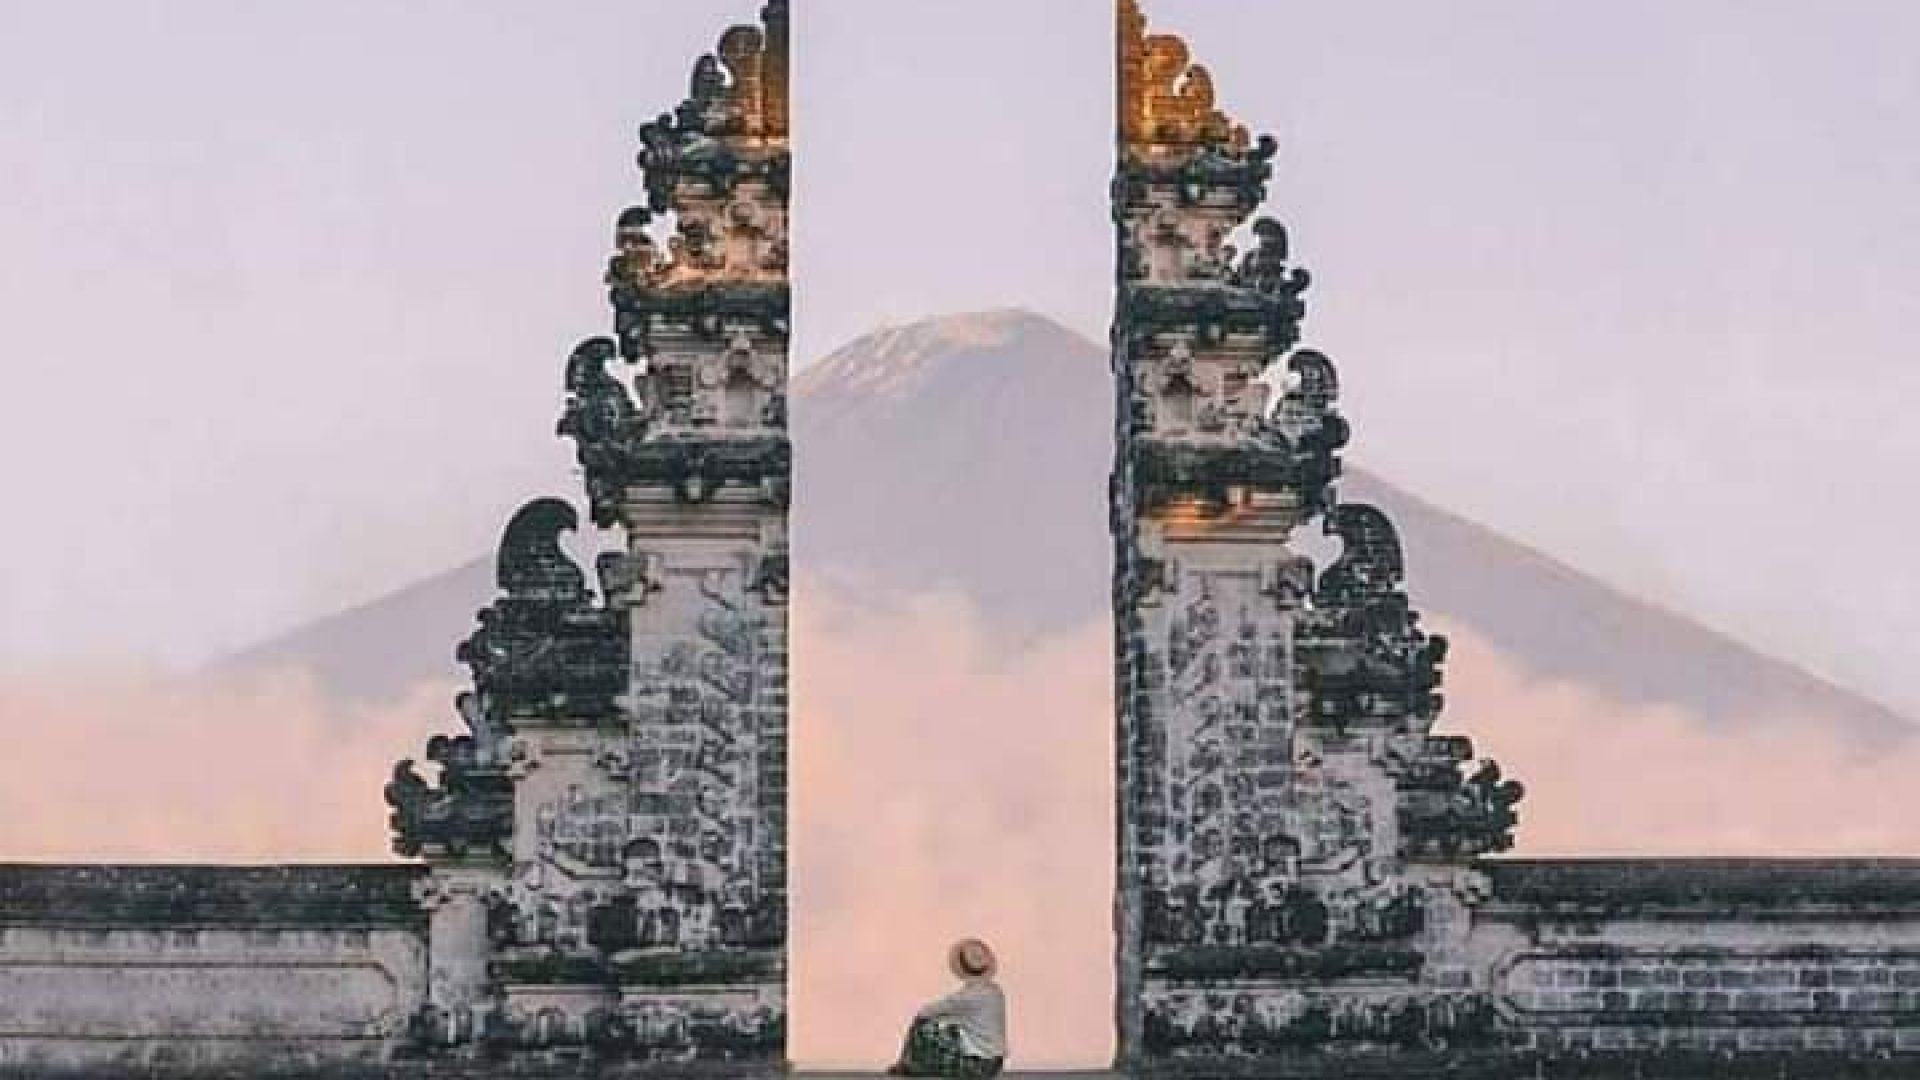 Pemuteran North Bali